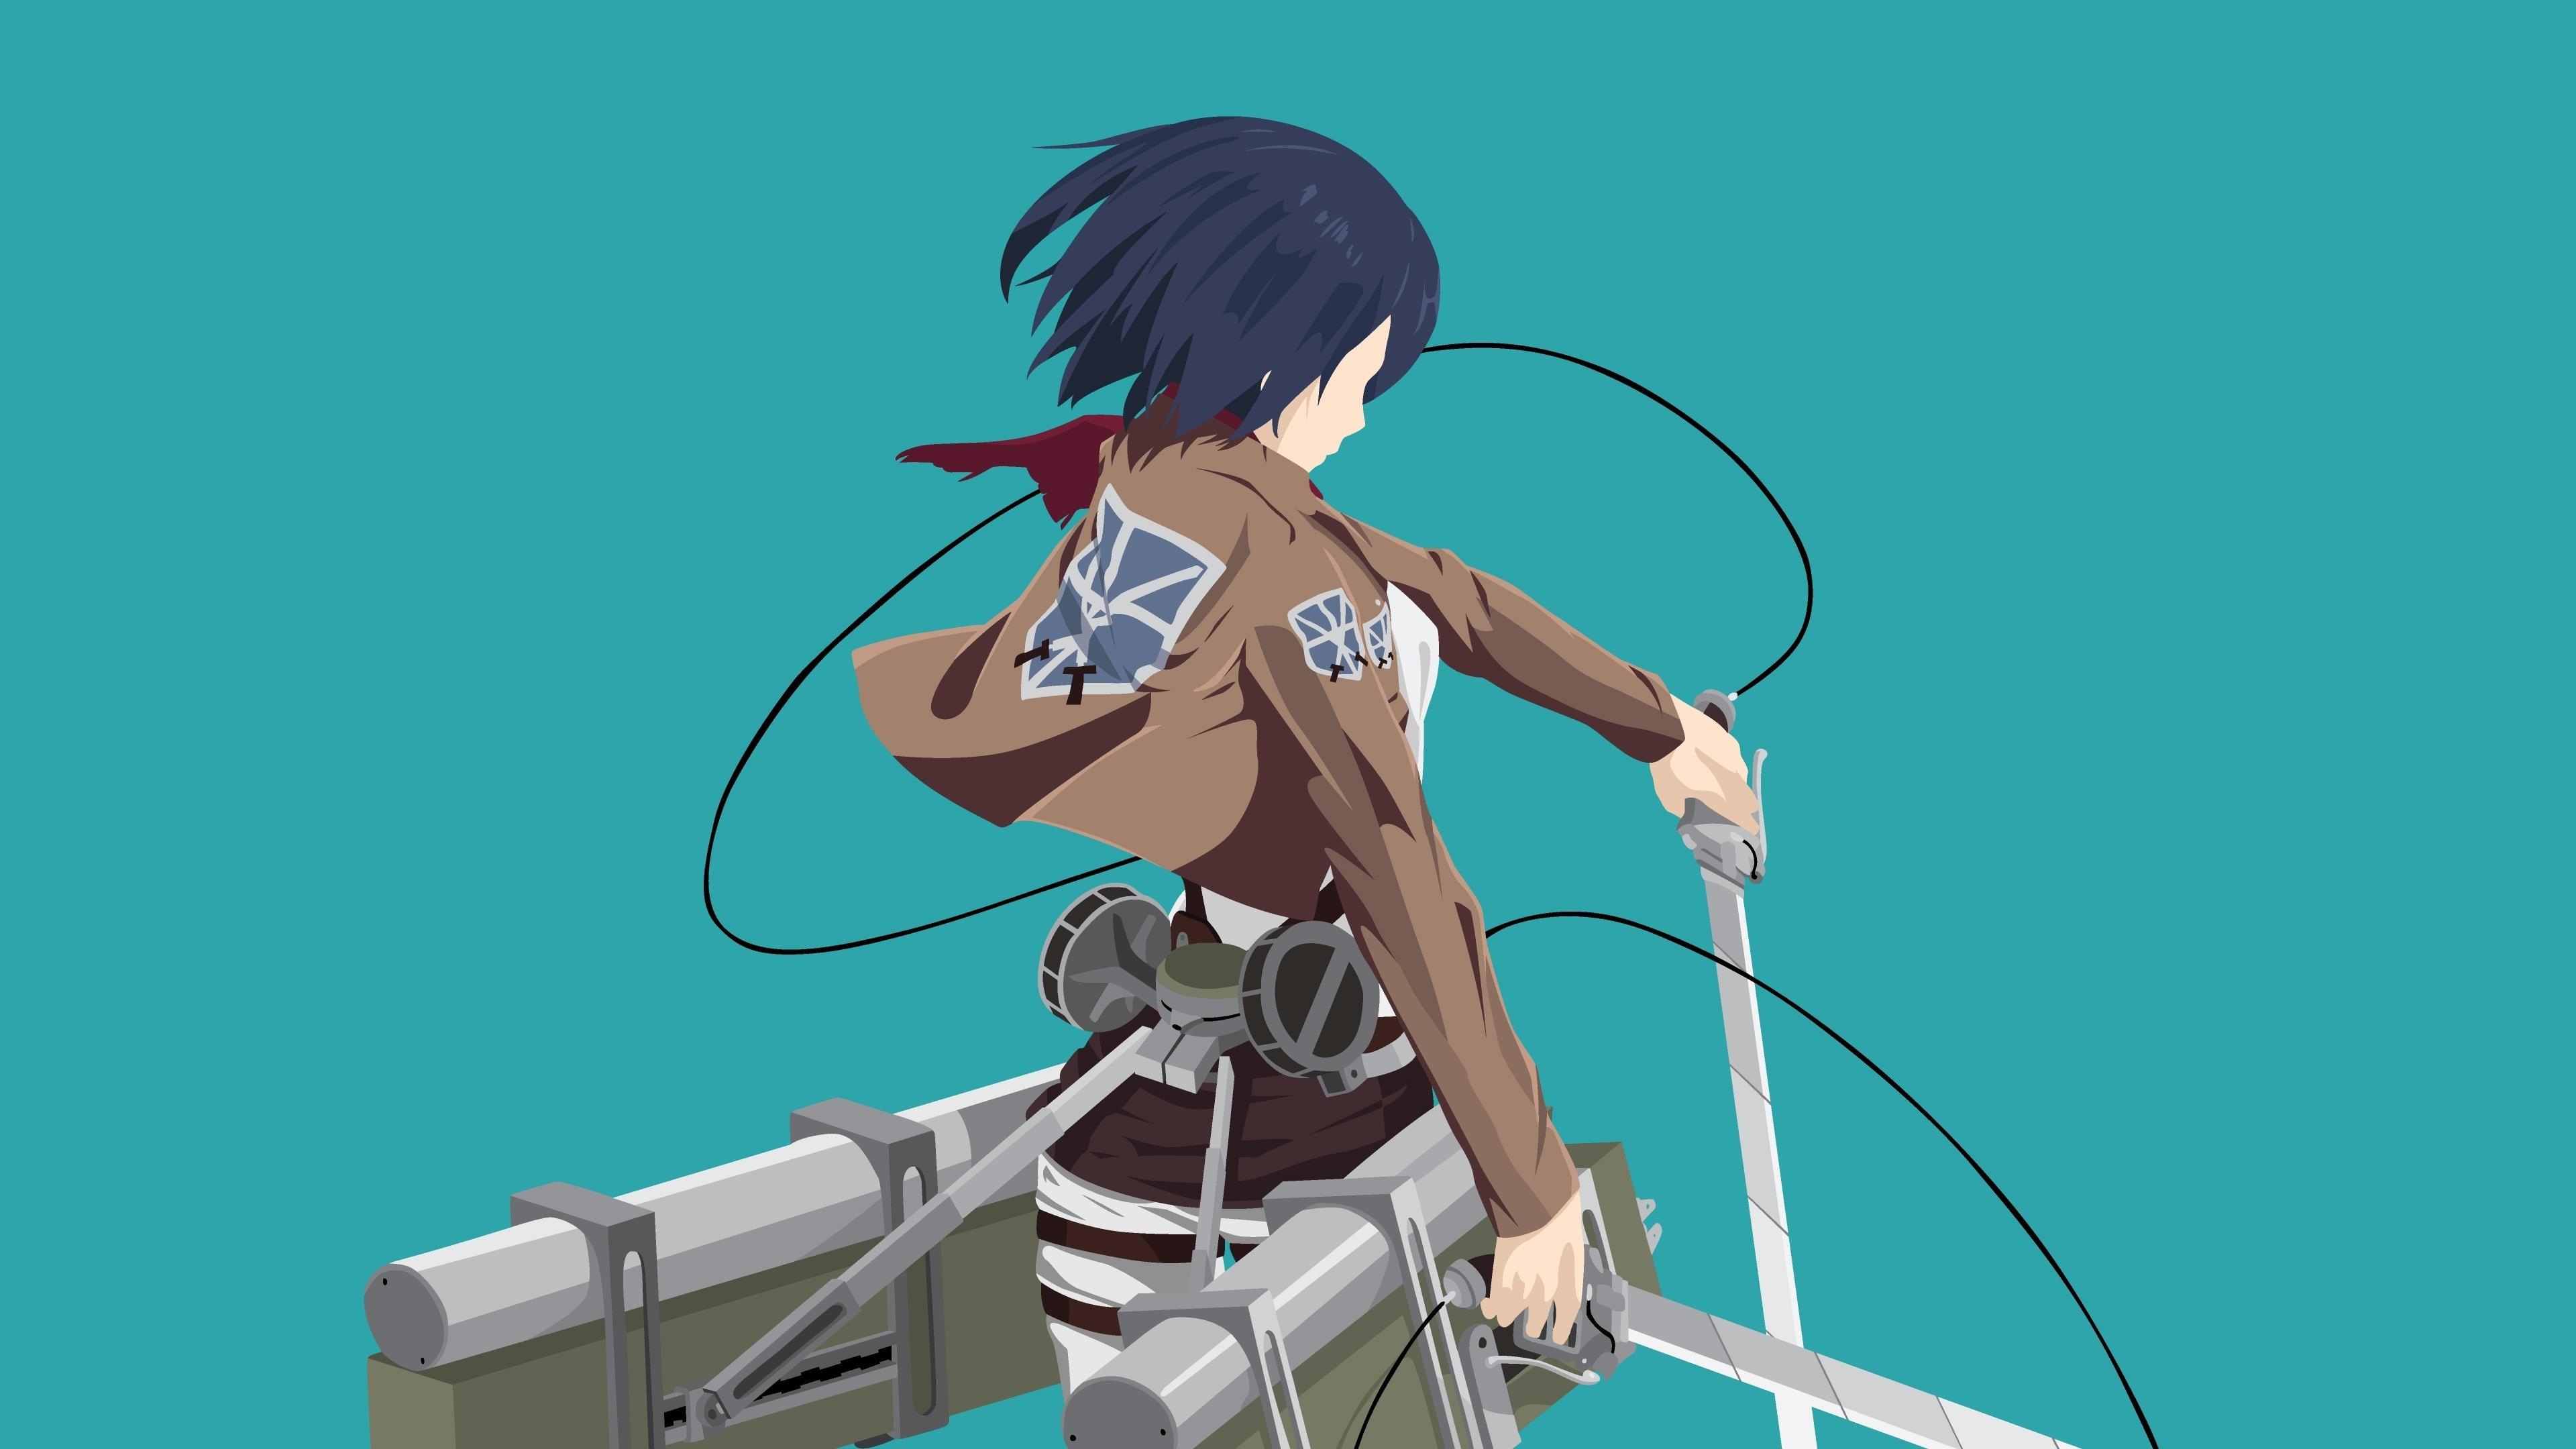 Download 3840x2400 Wallpaper Anime Girl Mikasa Ackerman Minimal 4k Ultra Hd 16 10 Widescreen 3840x2400 Hd Image Background 4075